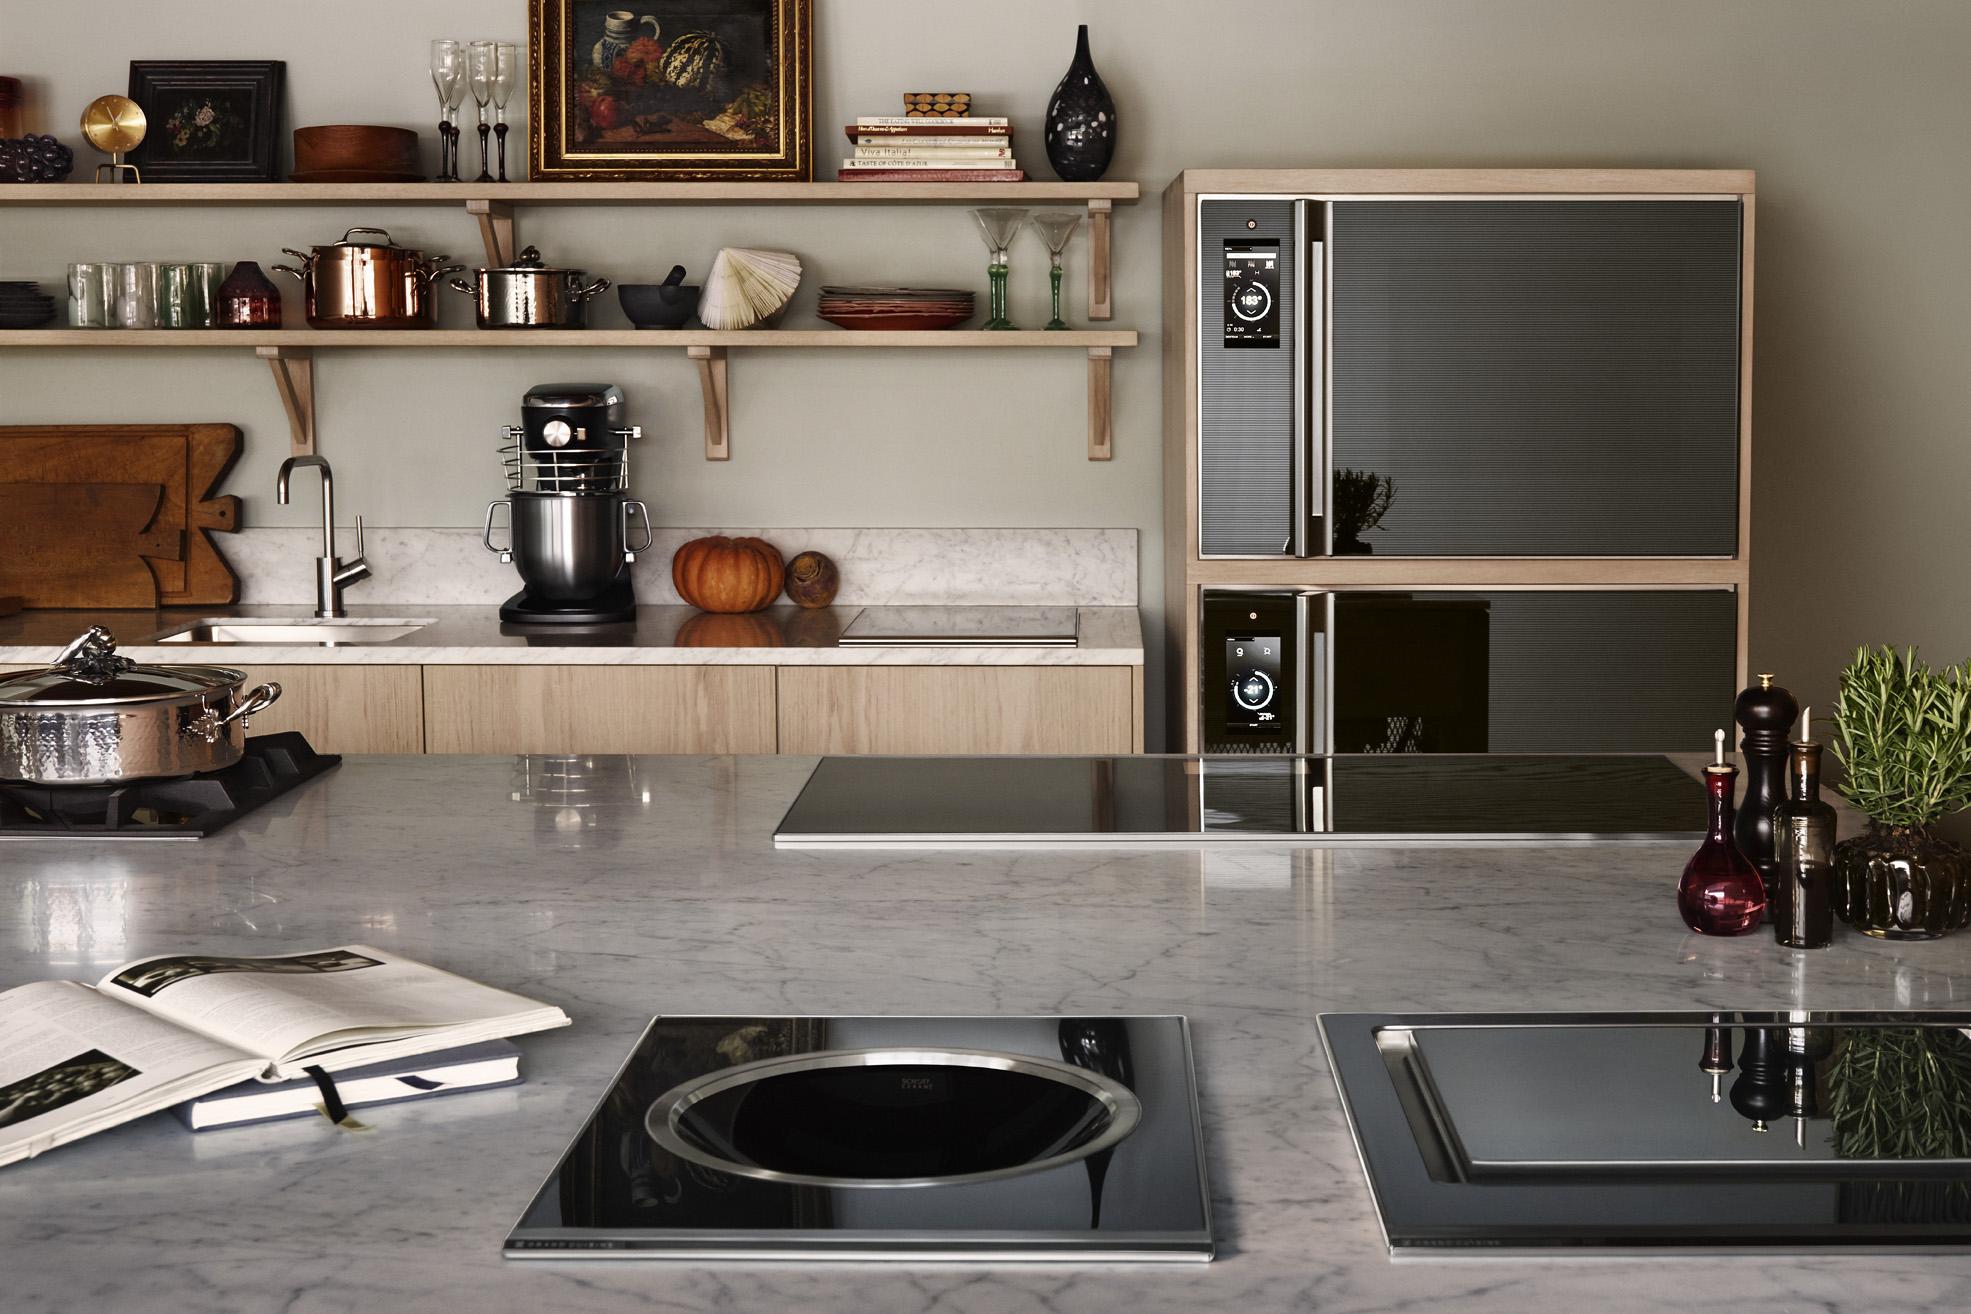 Дизайн кухни 20 кв м с полками